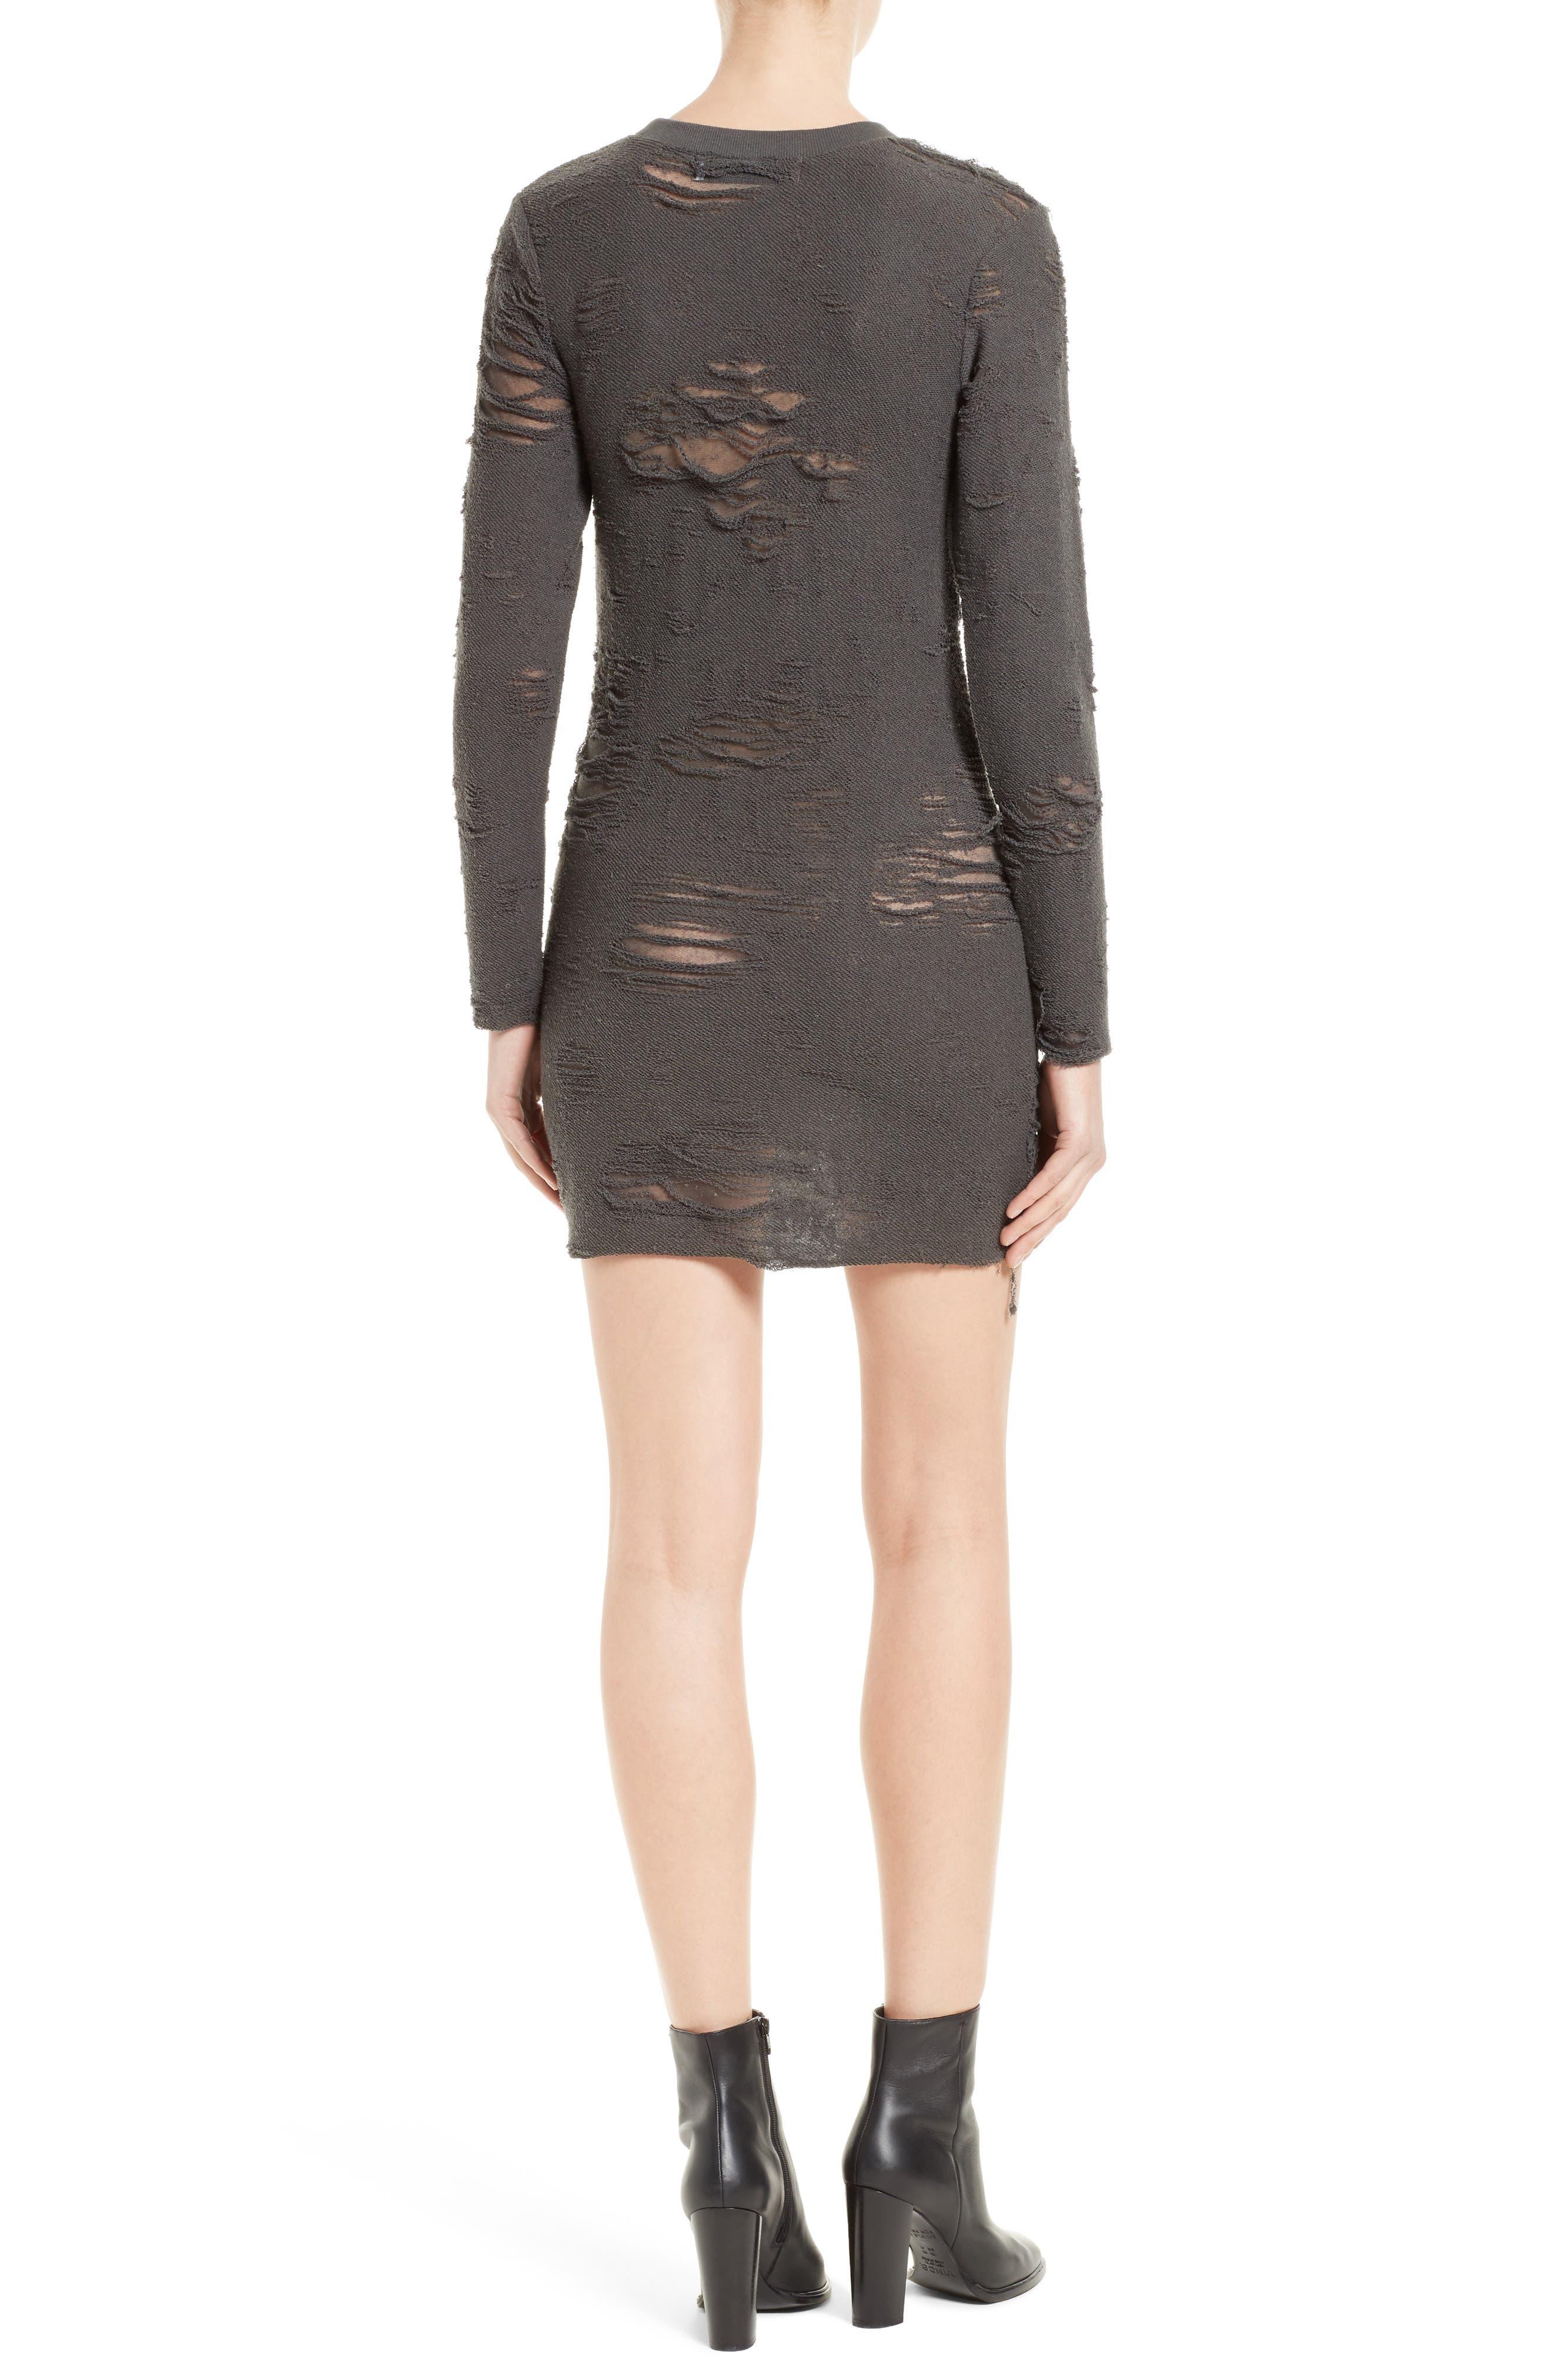 Cevoc Distressed Dress,                             Alternate thumbnail 2, color,                             029